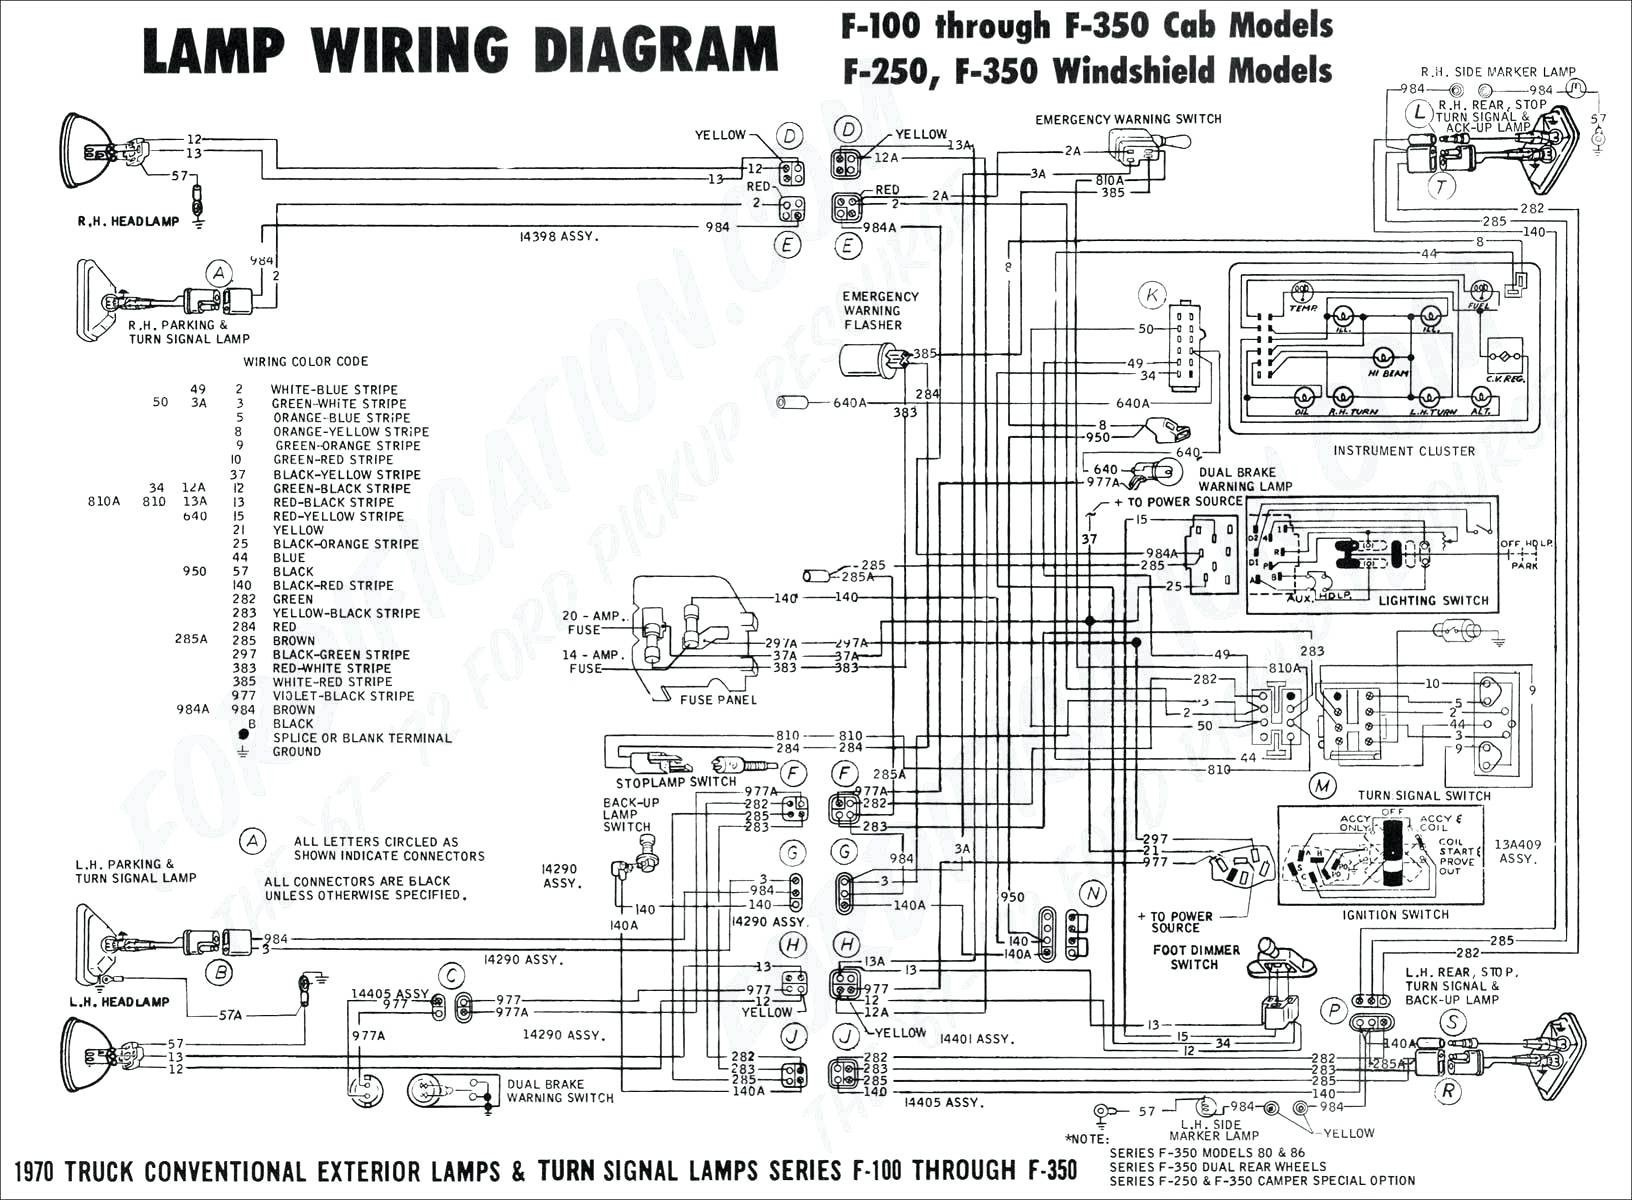 2005 ford Explorer 4×4 Wiring Diagram Diagram] 99 ford Ranger Body Wiring Diagram Full Version Hd Of 2005 ford Explorer 4×4 Wiring Diagram